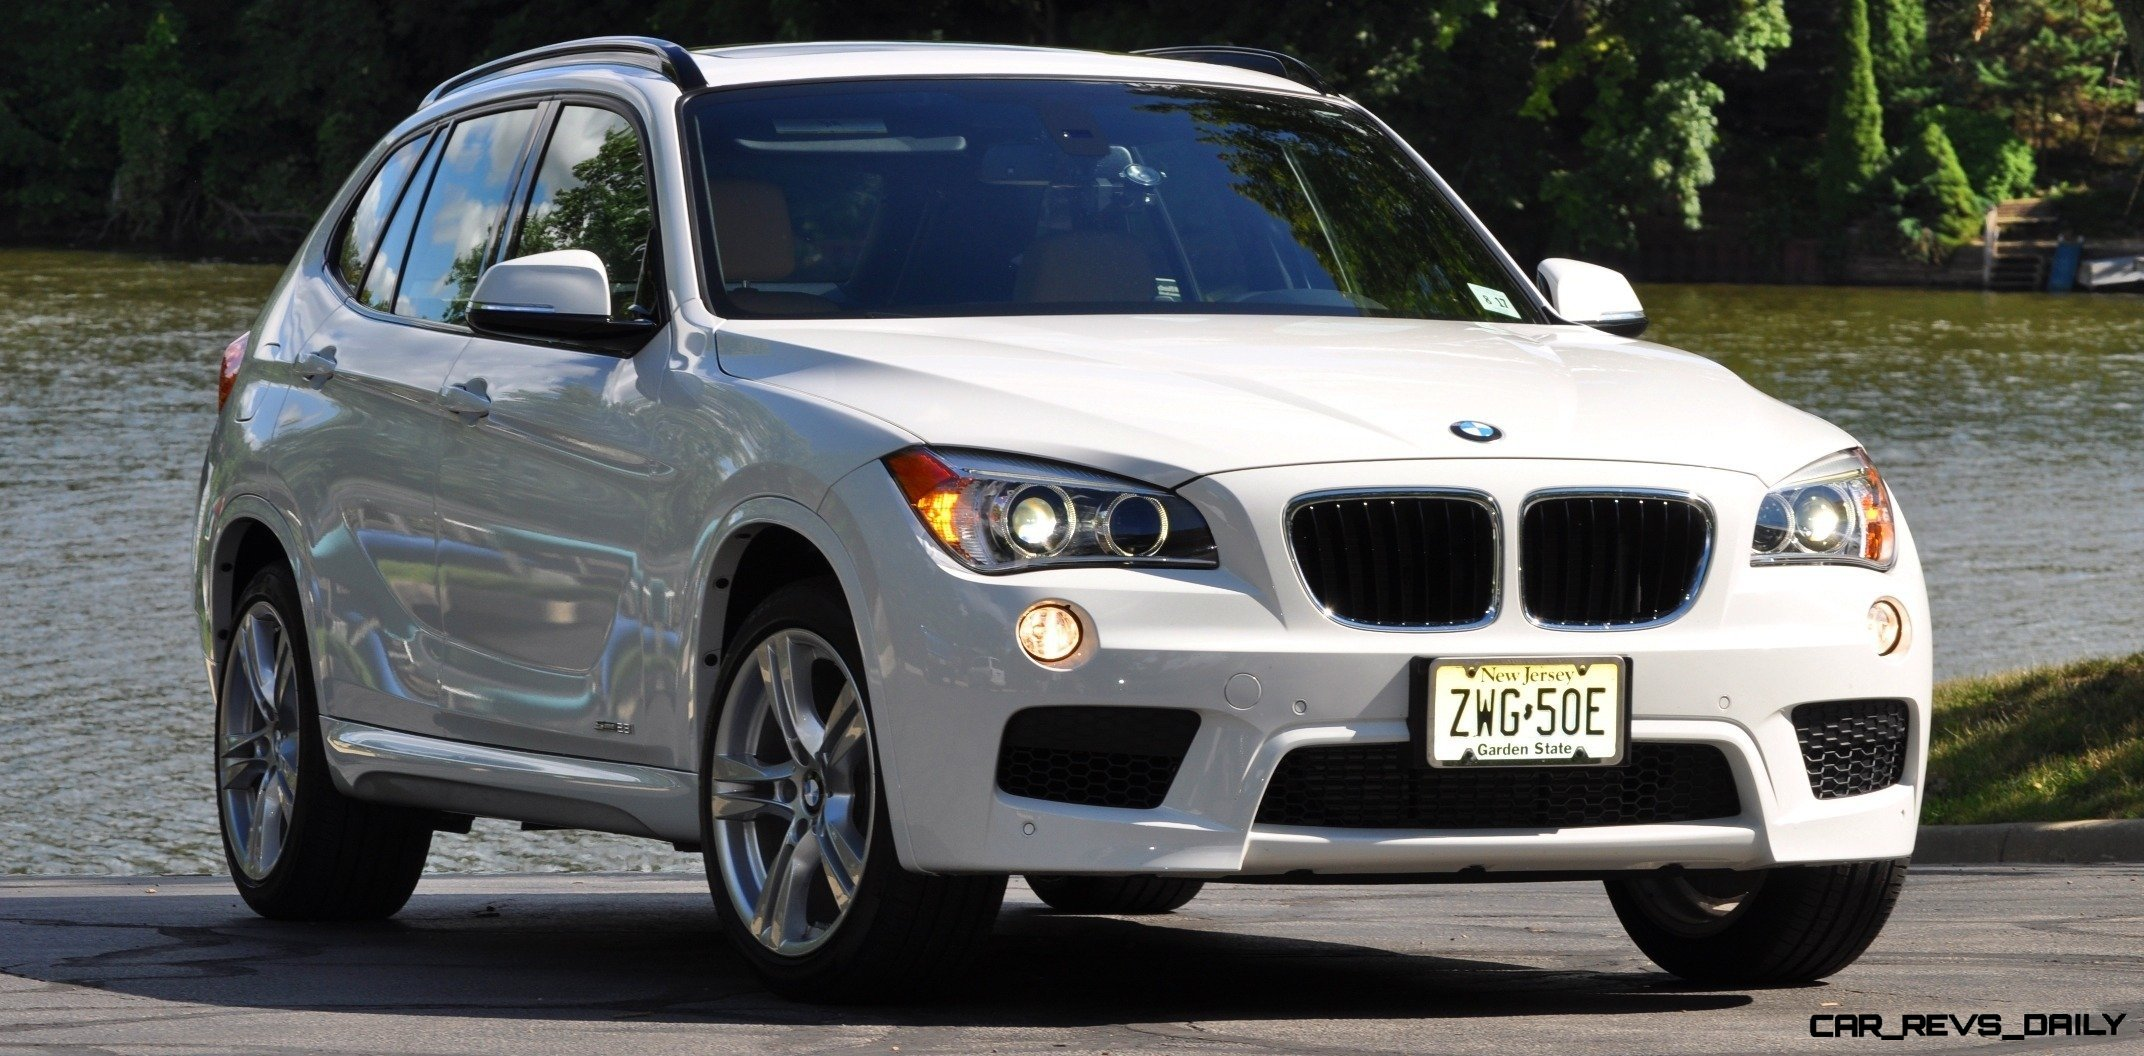 BMW X1 sDrive28i M Sport - Alpine White in 60 High-Res Photos35